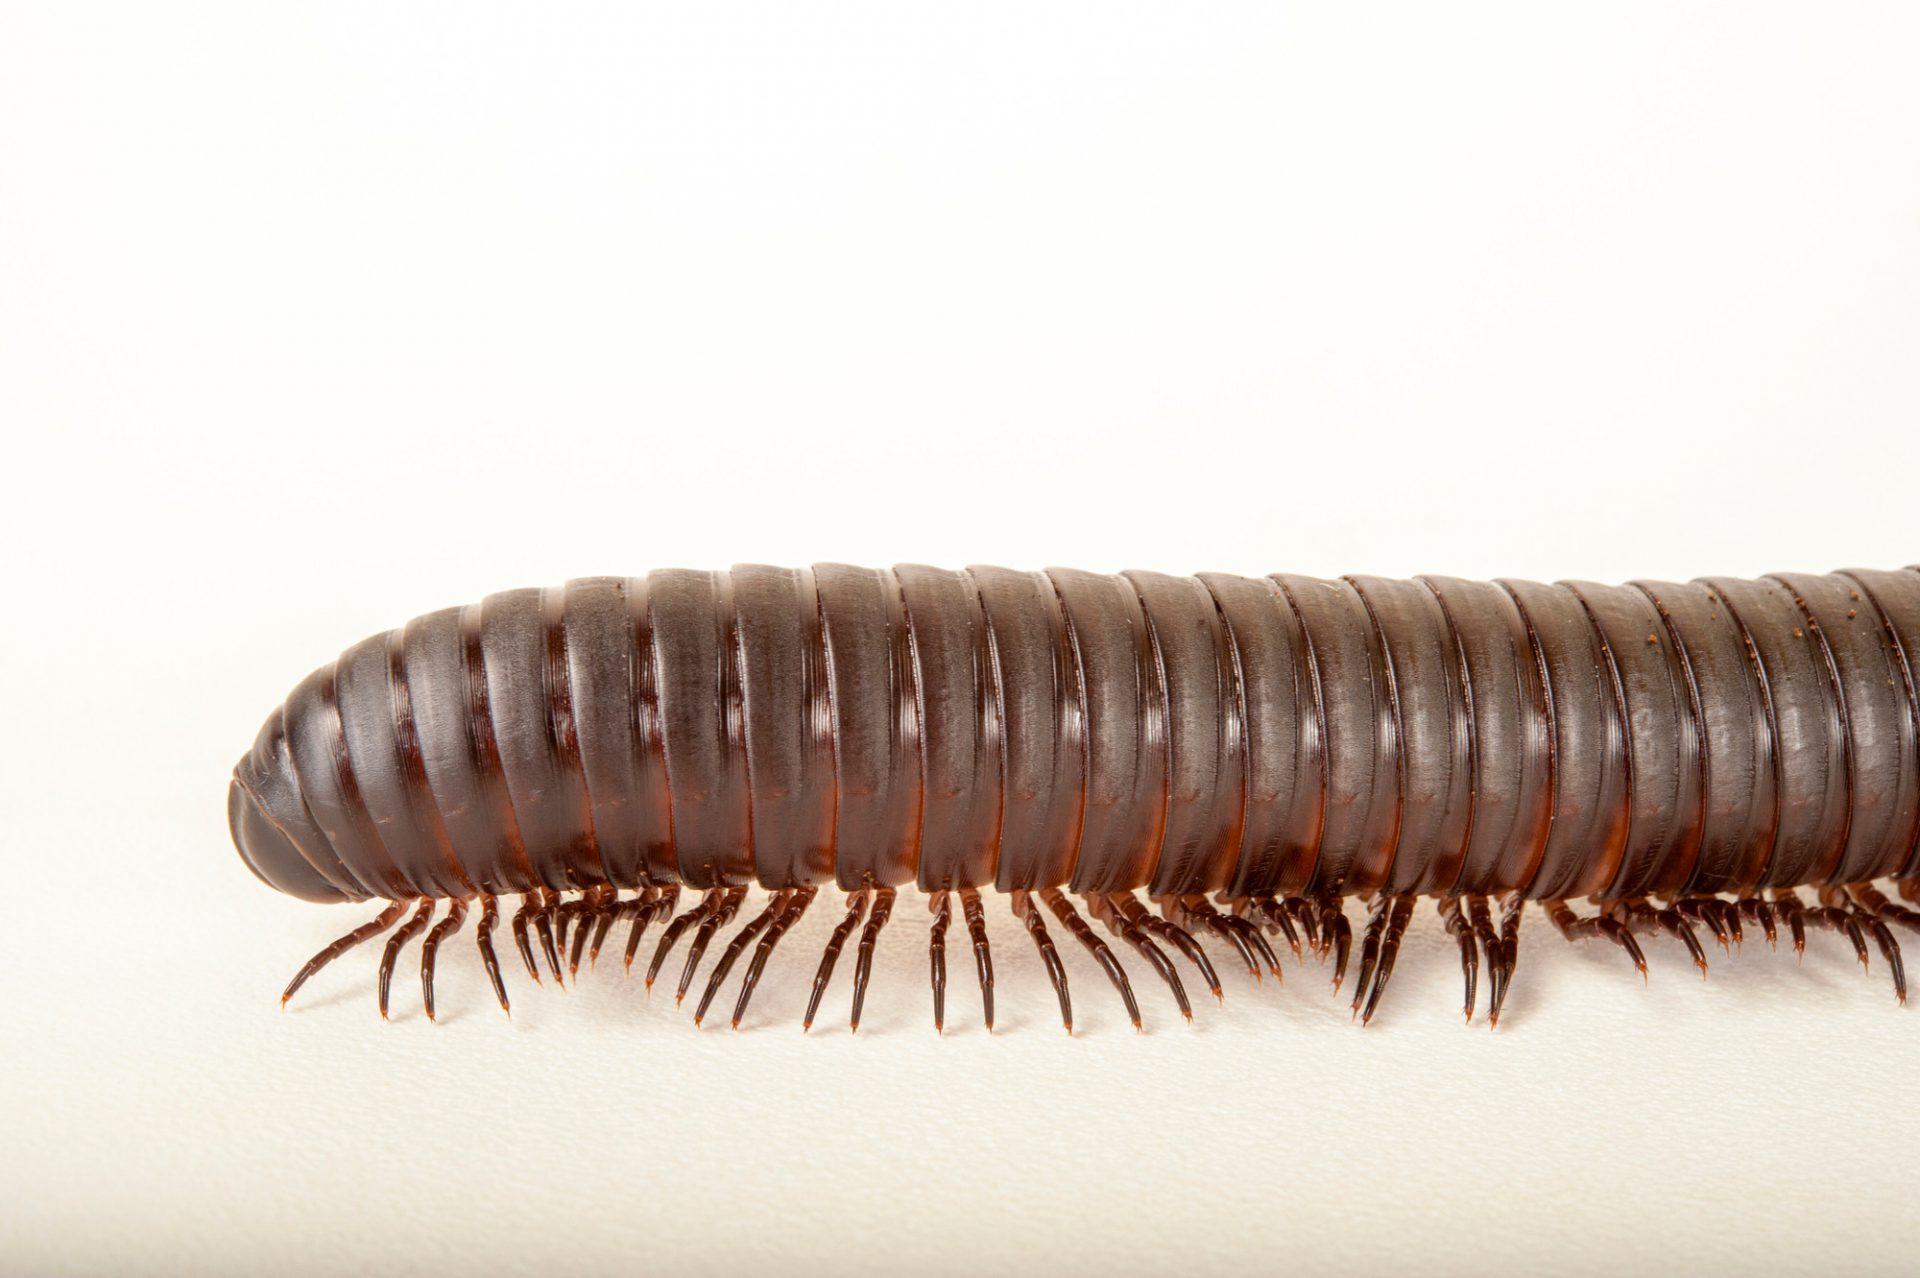 Picture of an African giant millipede (Archispirostreptus gigas) at Rolling Hills Wildlife Adventure near Salina, Kansas.